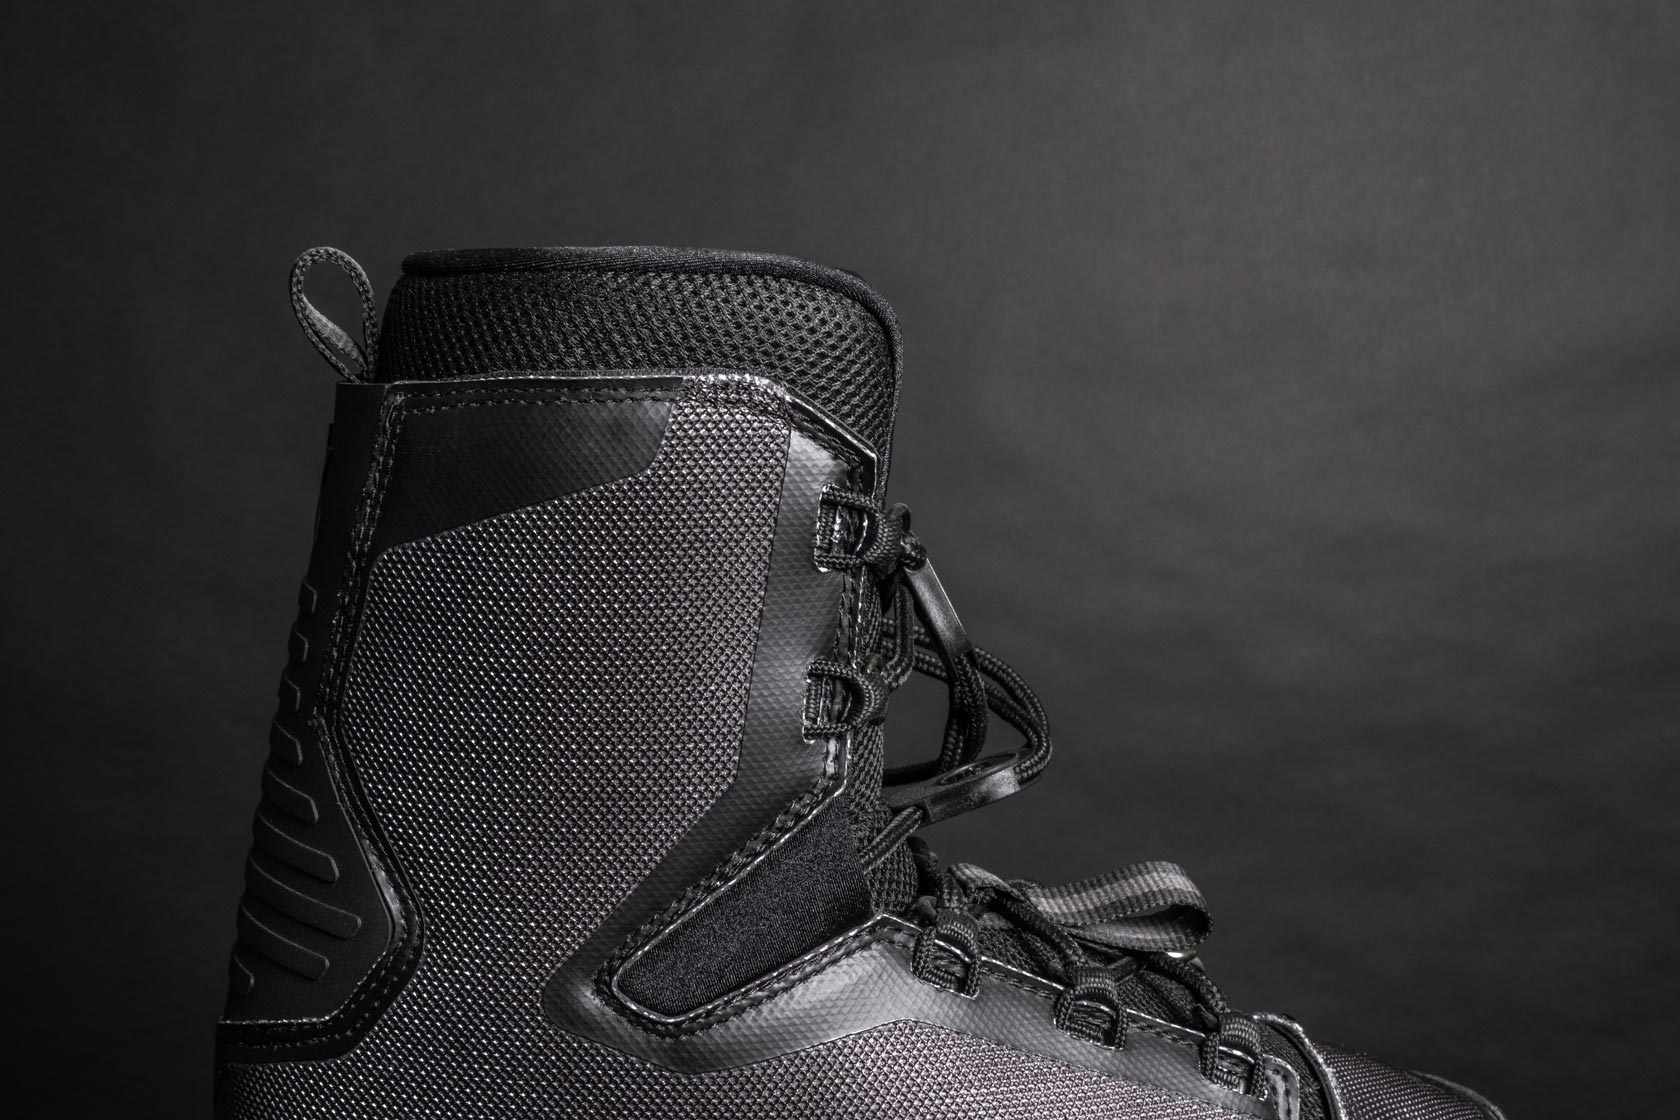 AK_Ether-Boot_High-Cut-Support-3